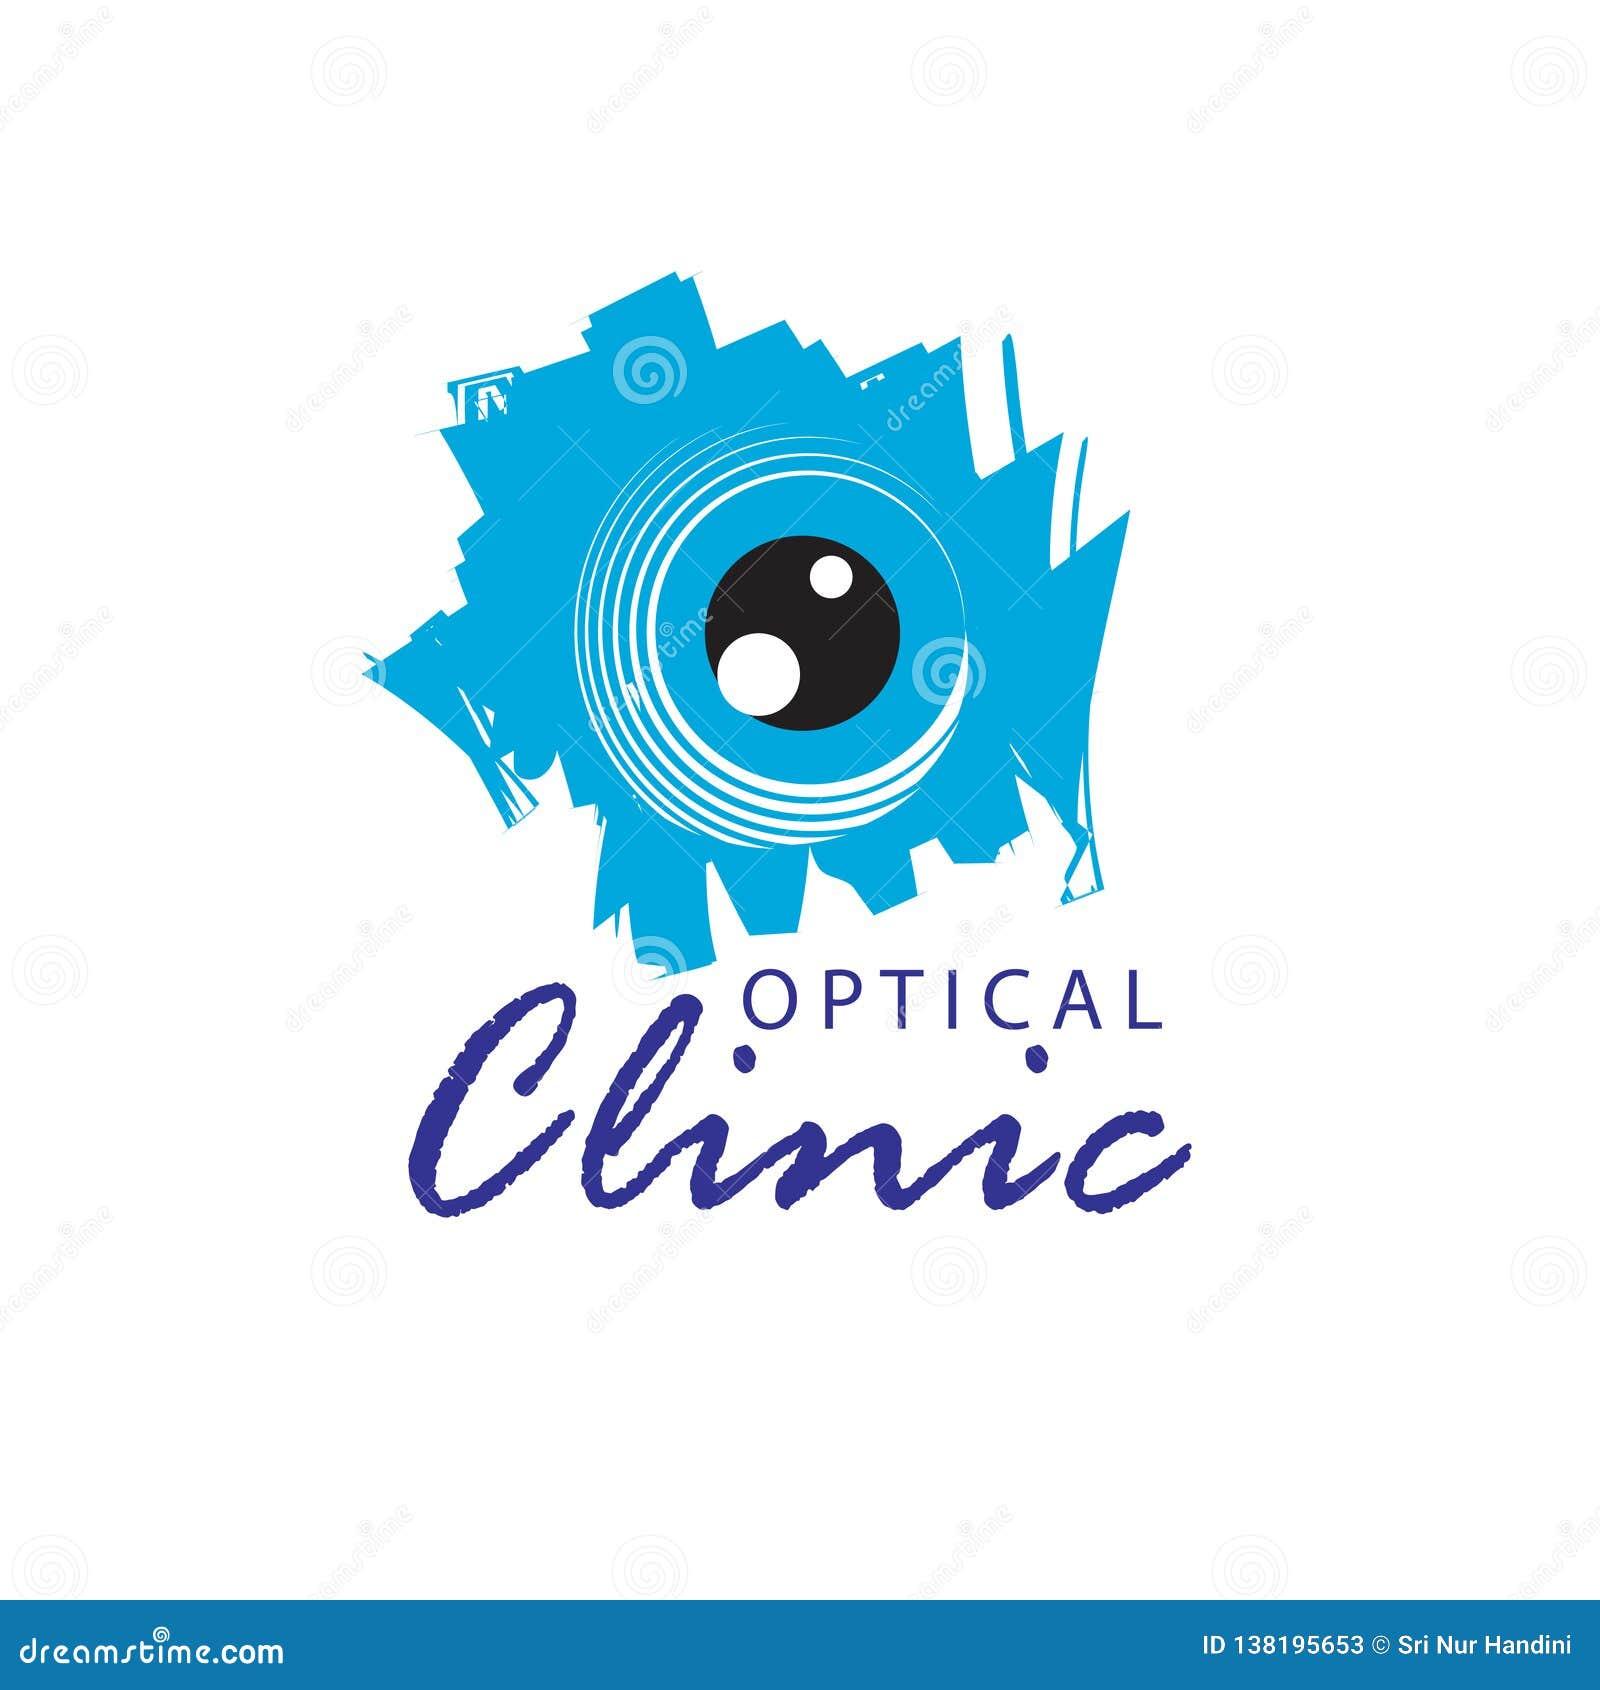 Logo Optical Clinic  Idea For Ophthalmic Clinic Or Eye